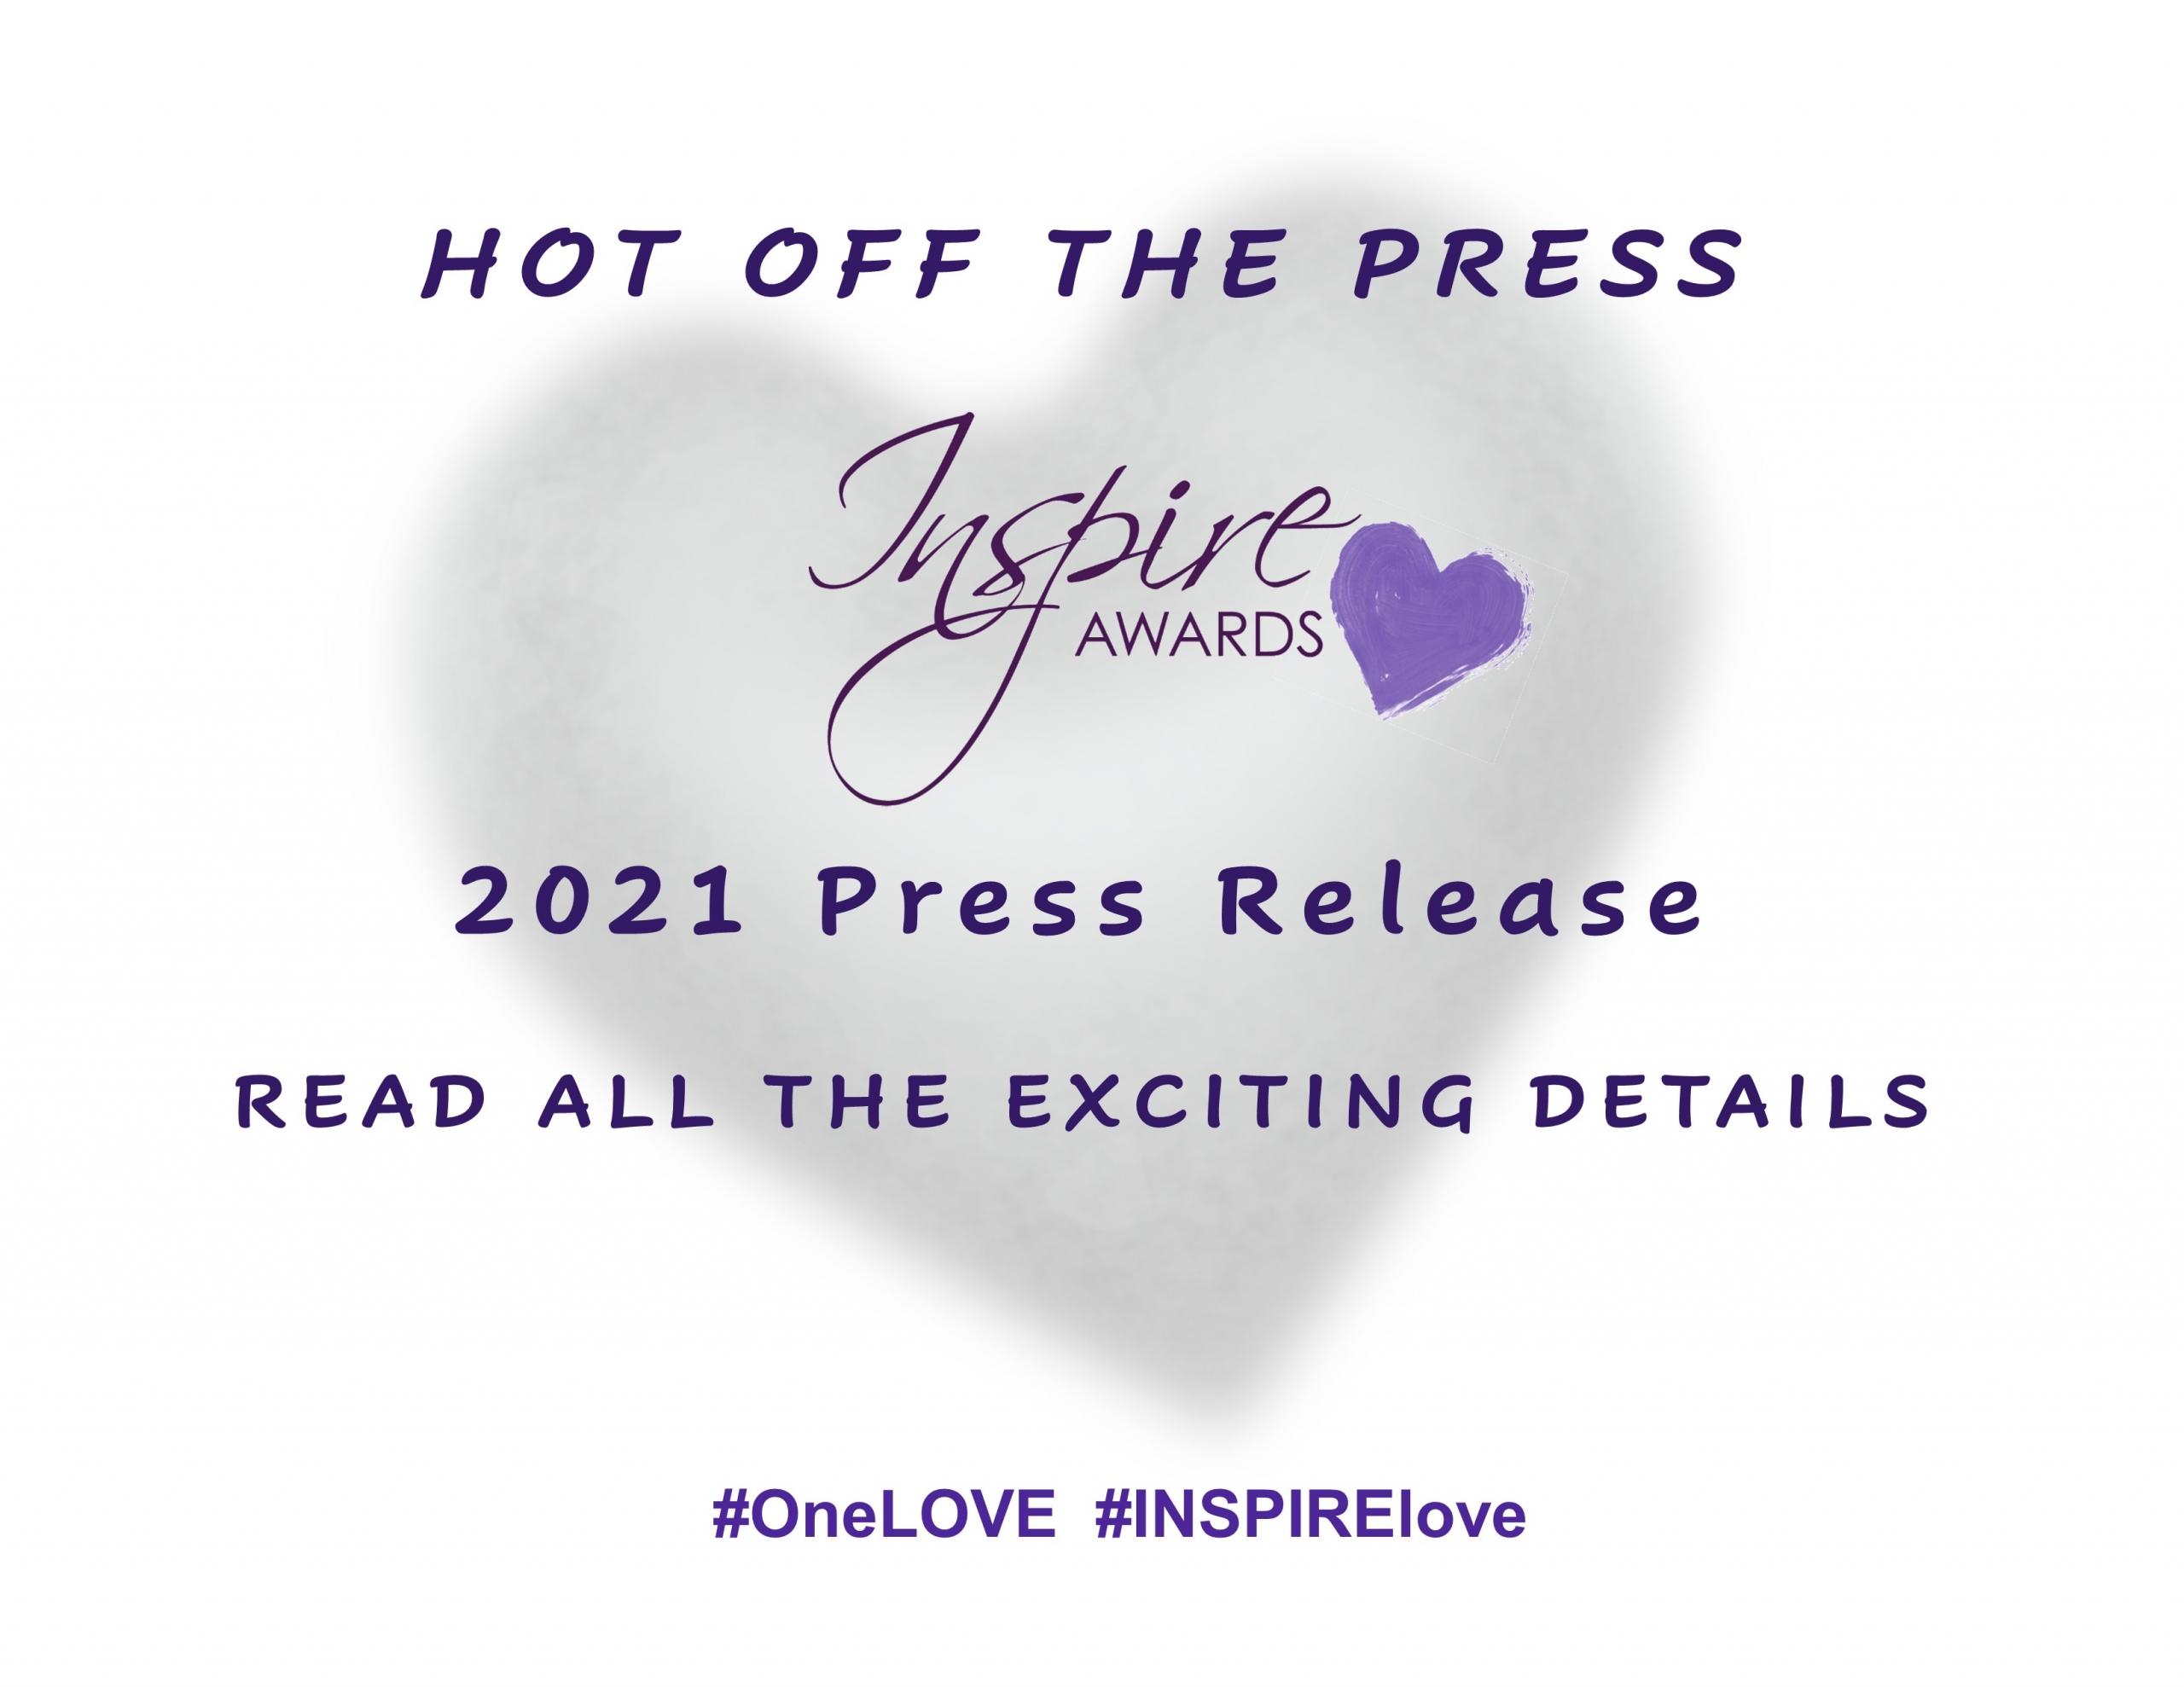 INSPIRE Awards Toronto 10th Anniversary 2021 Press Release